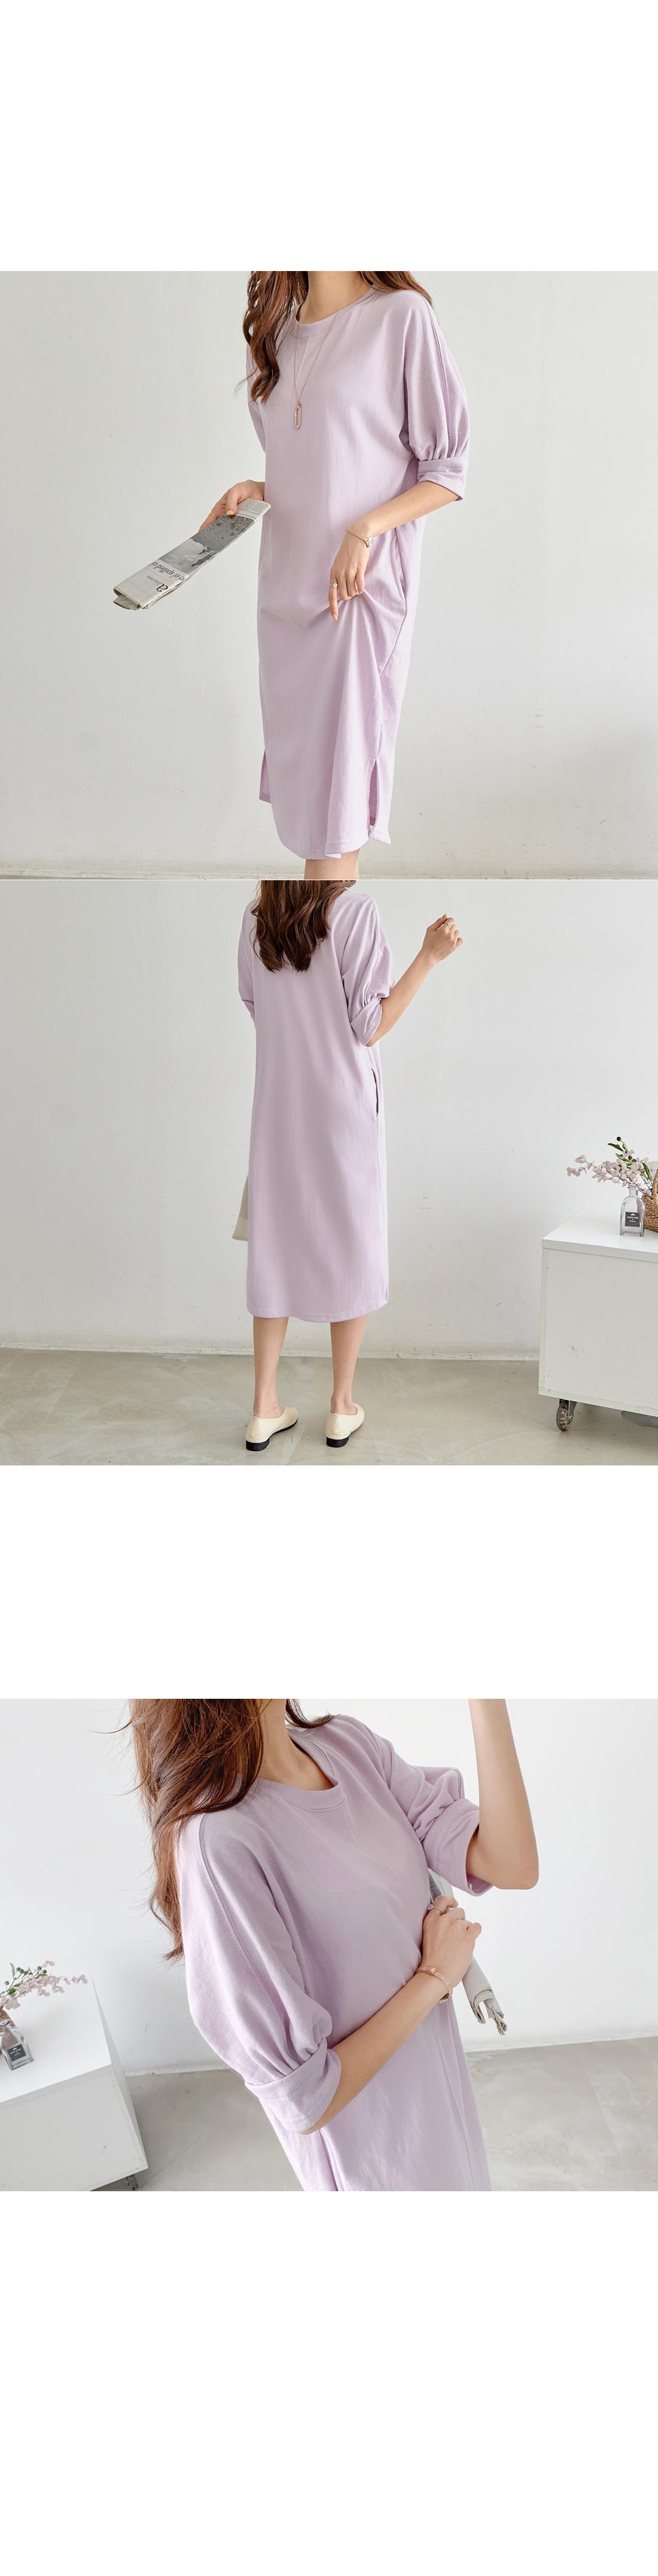 Balloon sleeve cotton long dress #35975